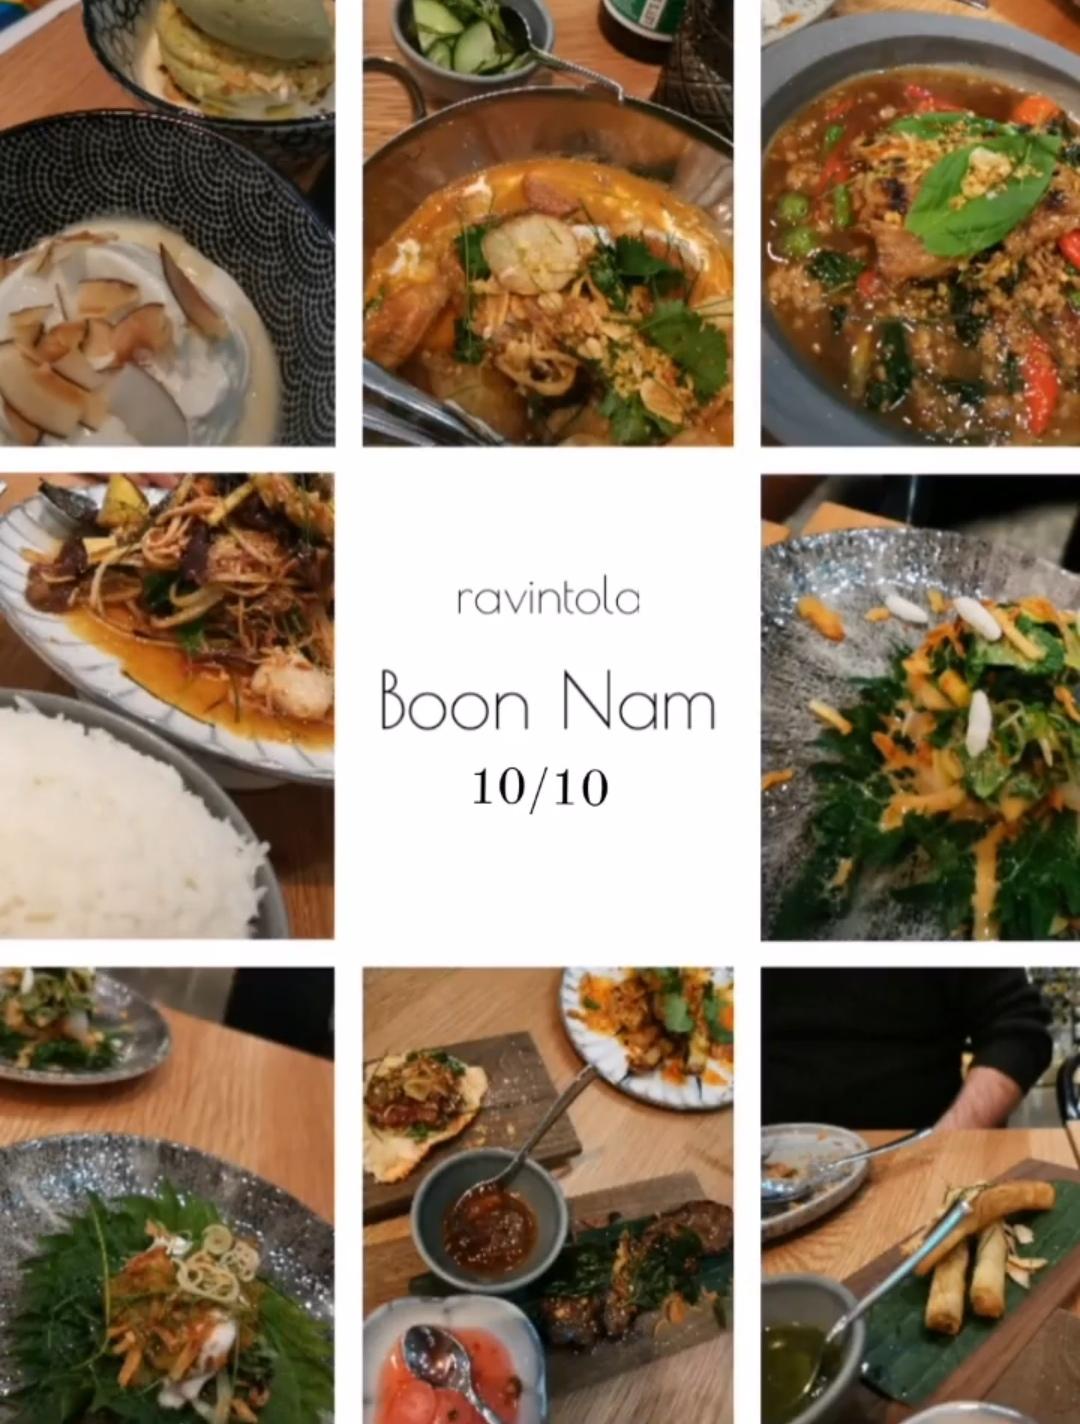 Boon nam